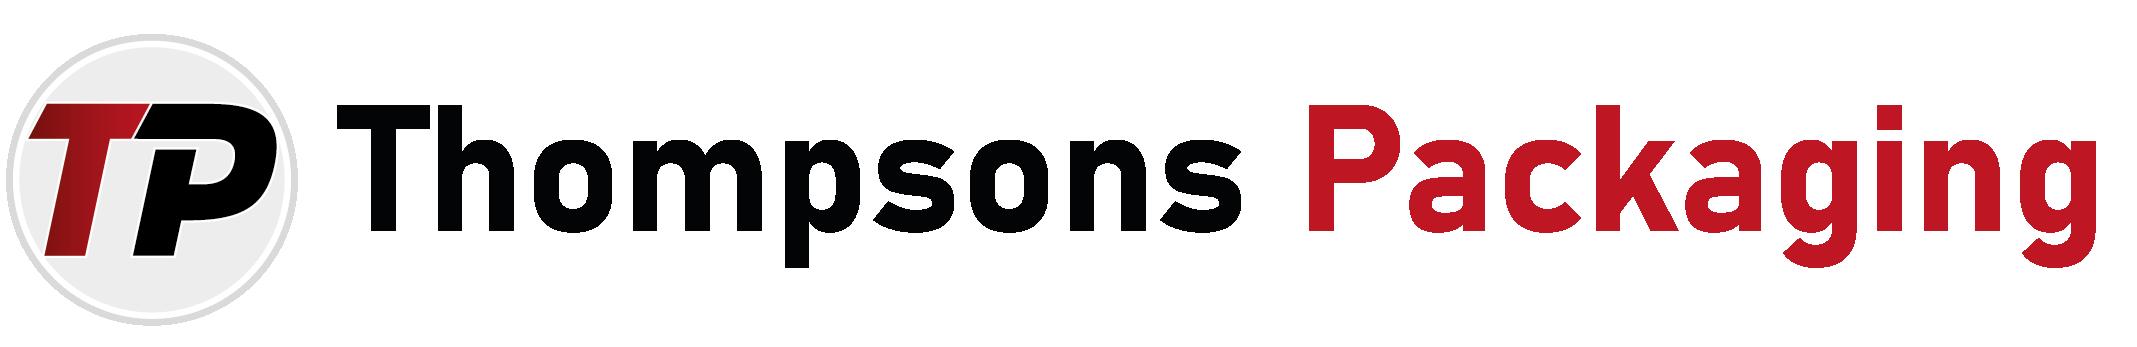 Thompsons Packaging Ltd